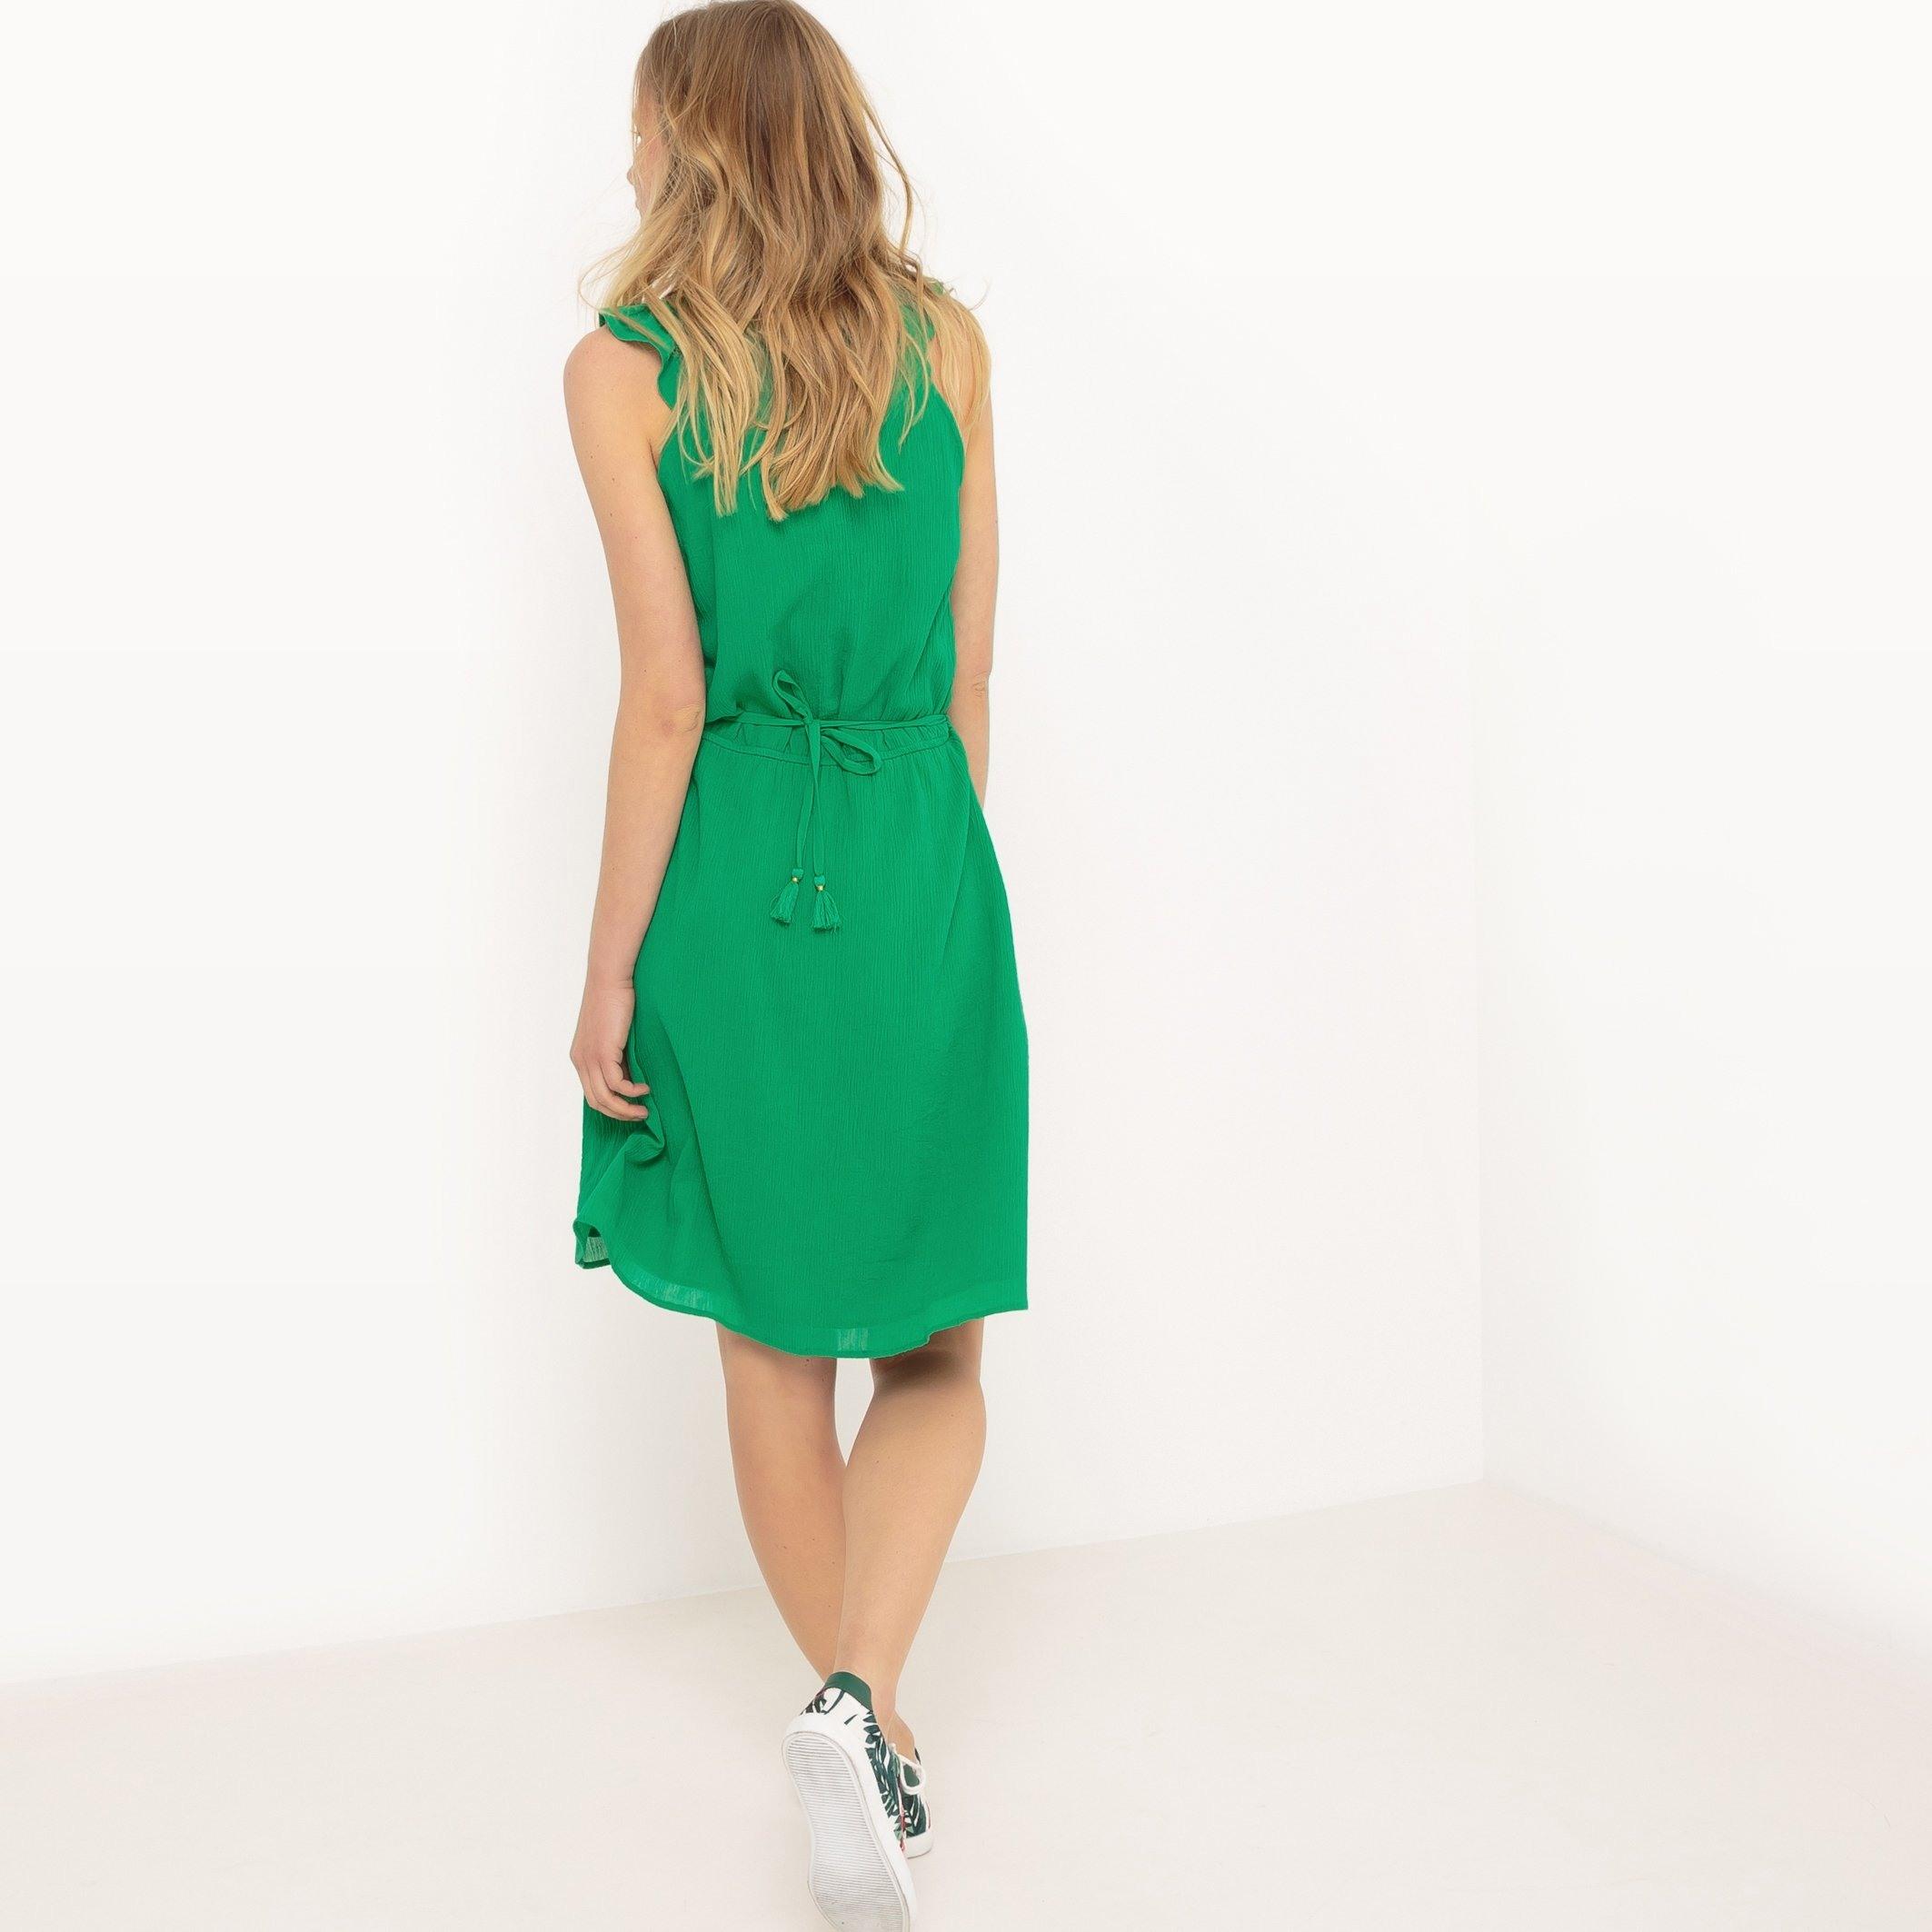 15 Schön Grünes Kleid Knielang Stylish17 Genial Grünes Kleid Knielang Vertrieb